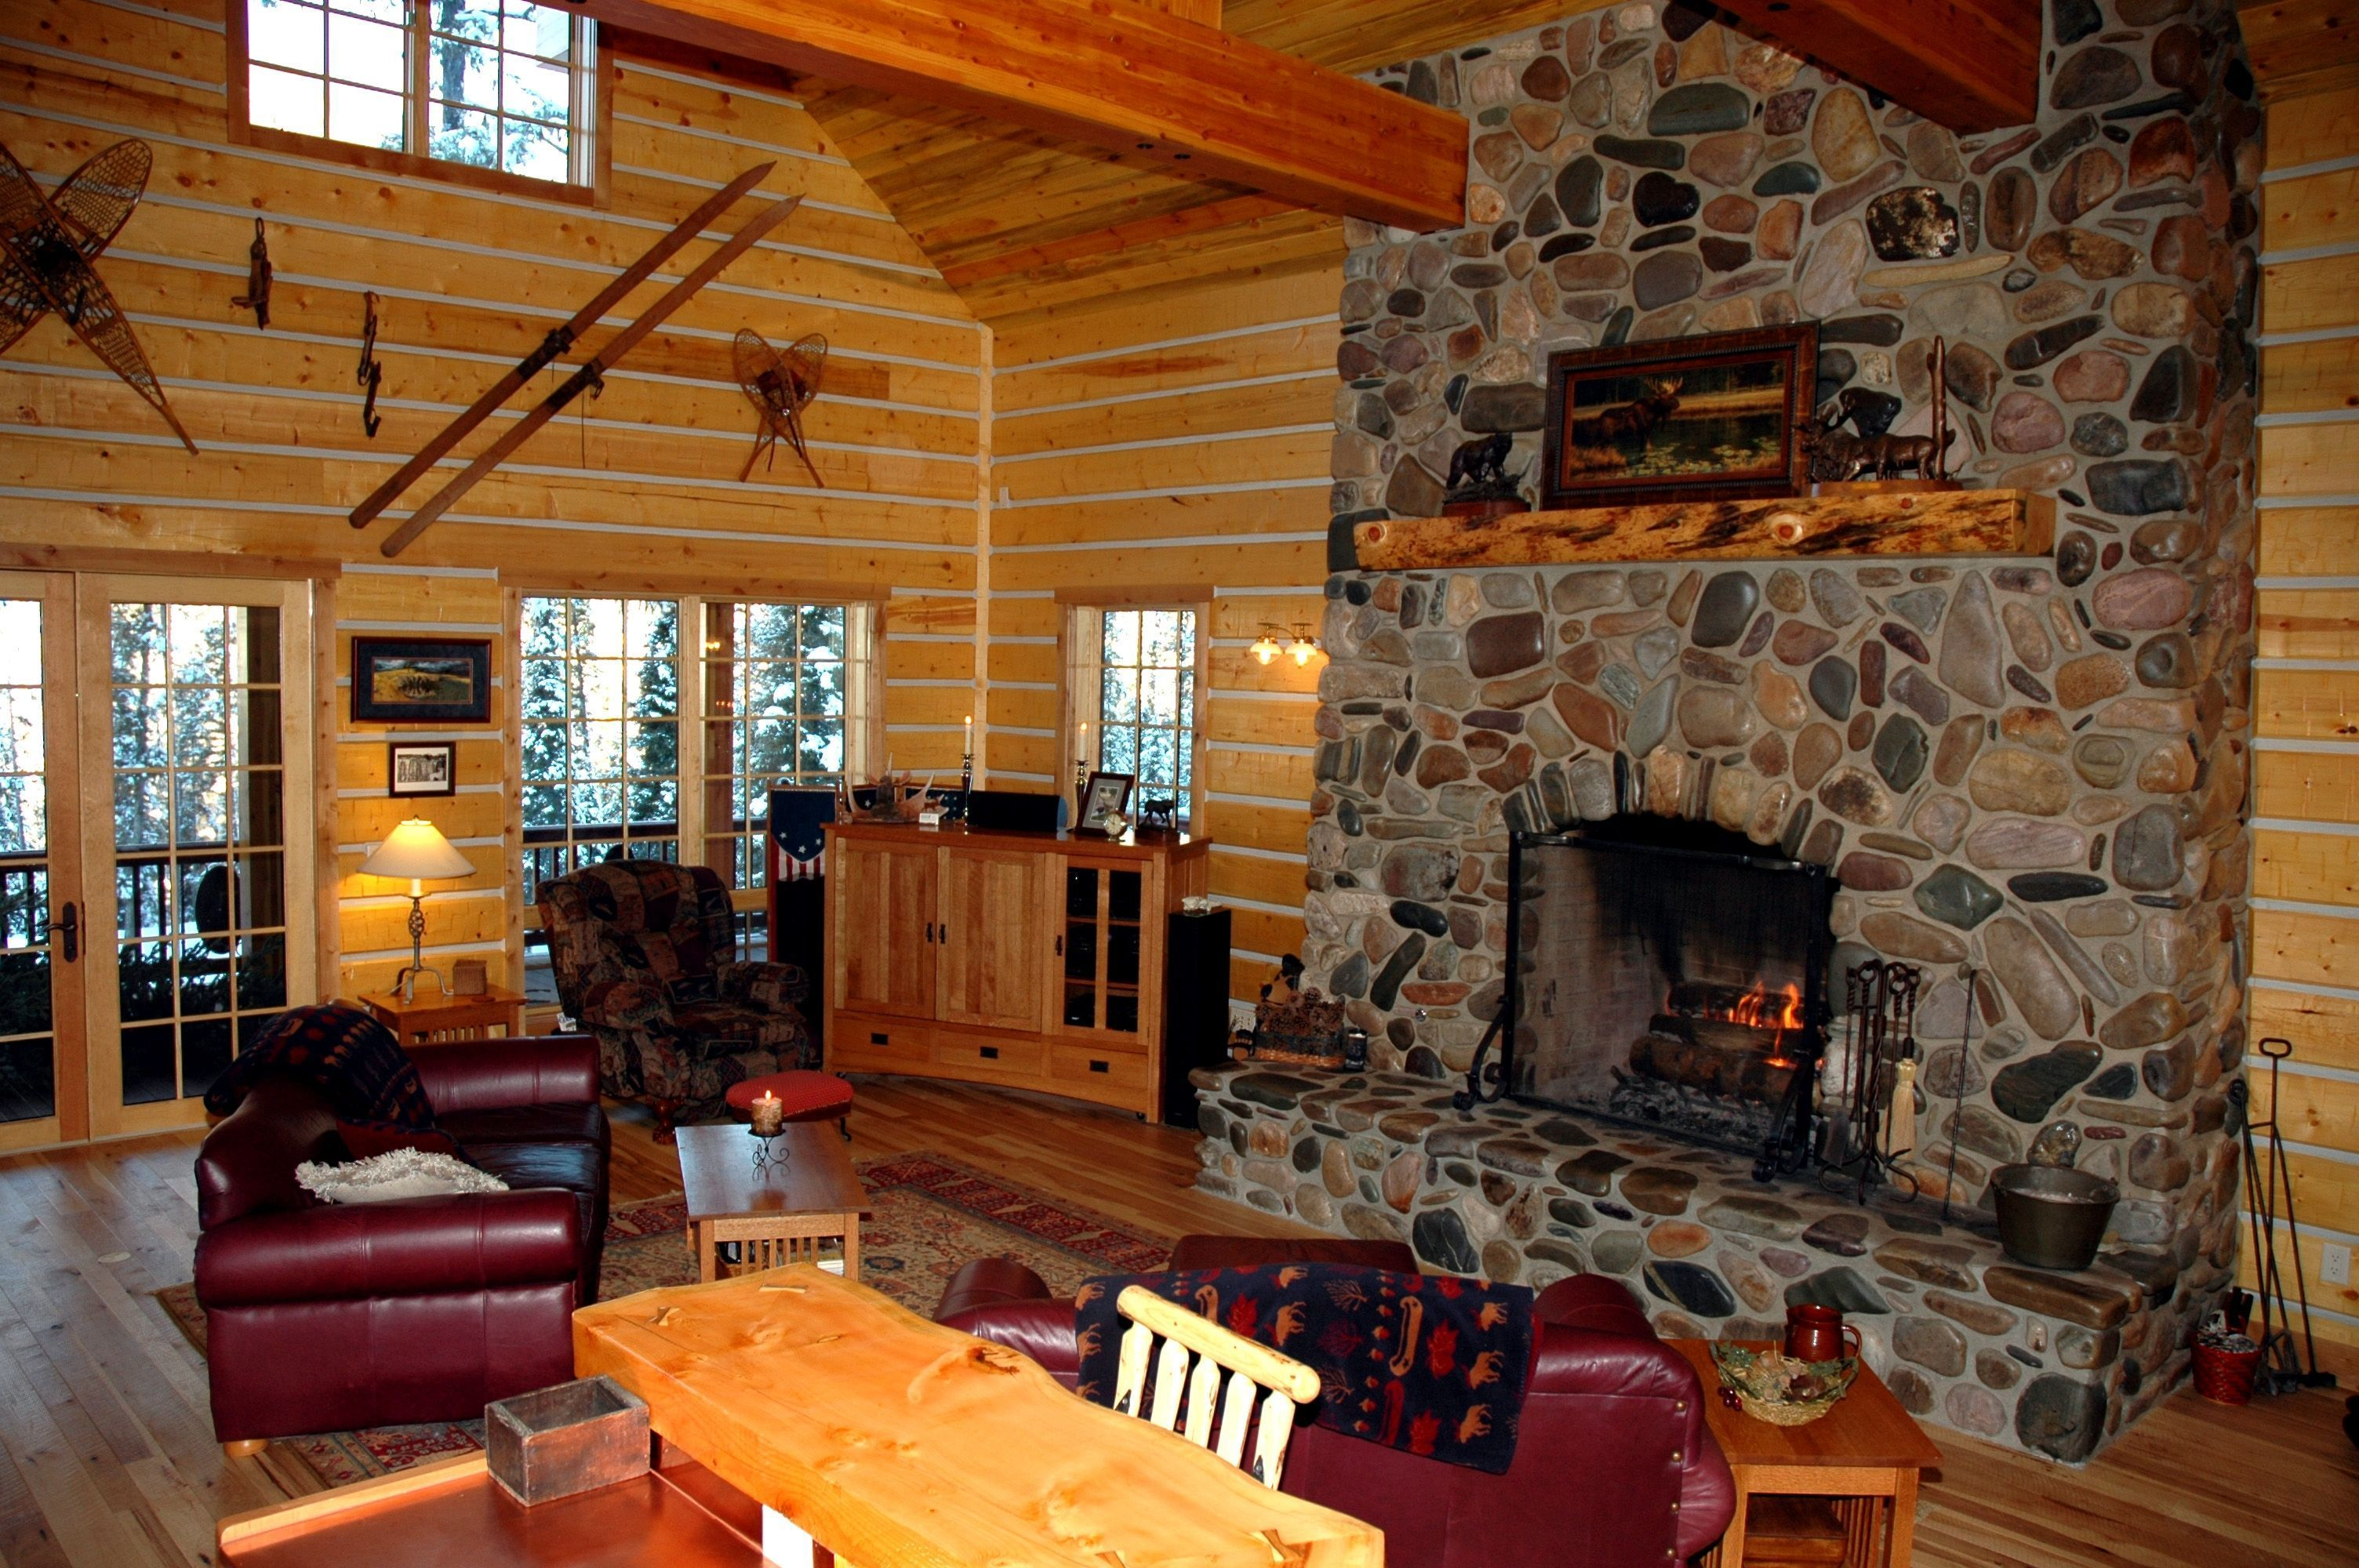 Log home interior ideas log cabin fireplace ideas  log home interior decorating ideas